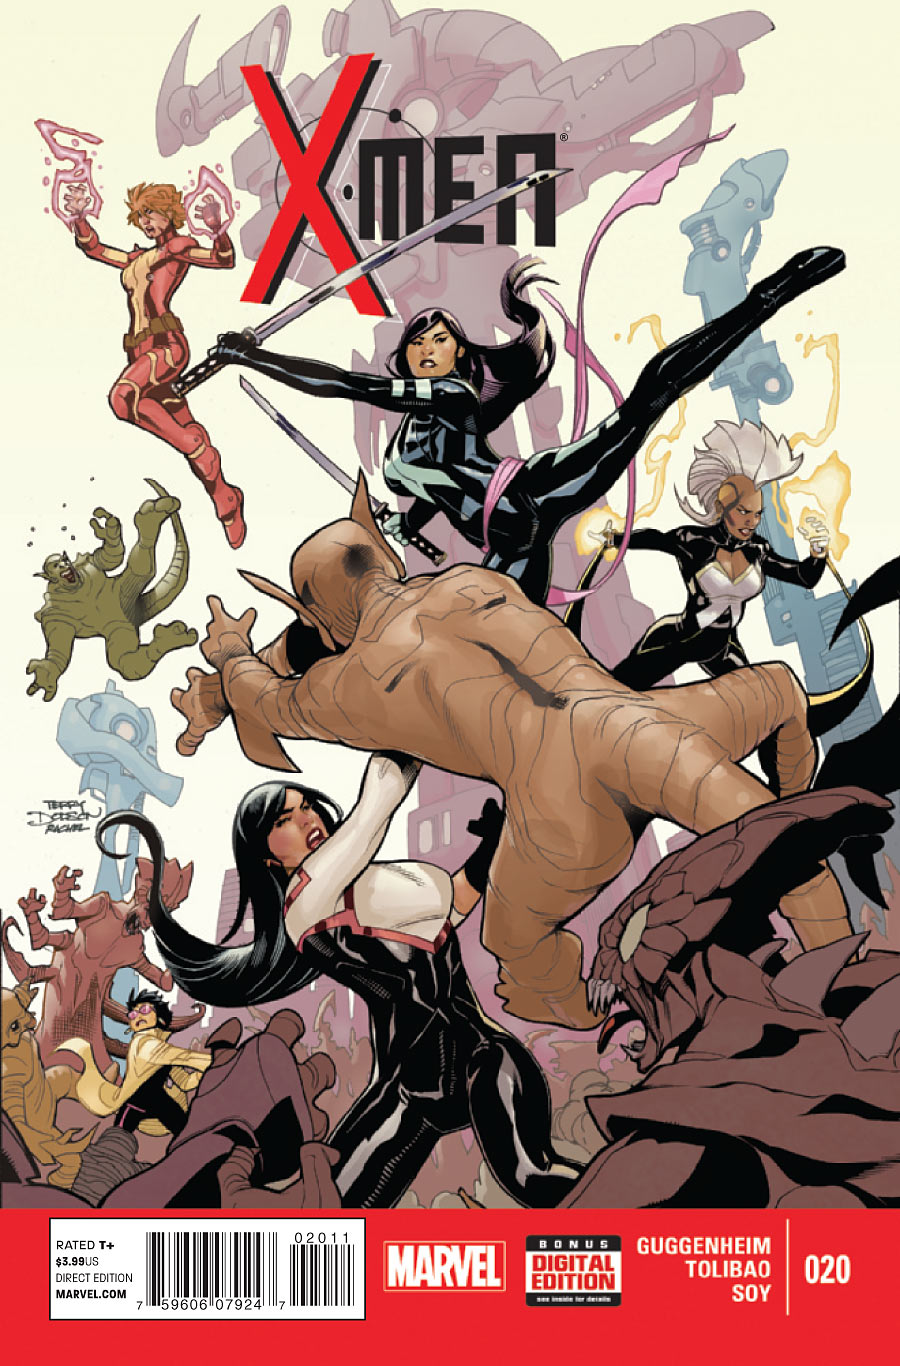 X-Men (Vol. 4) #20 - Cover (Final).jpg